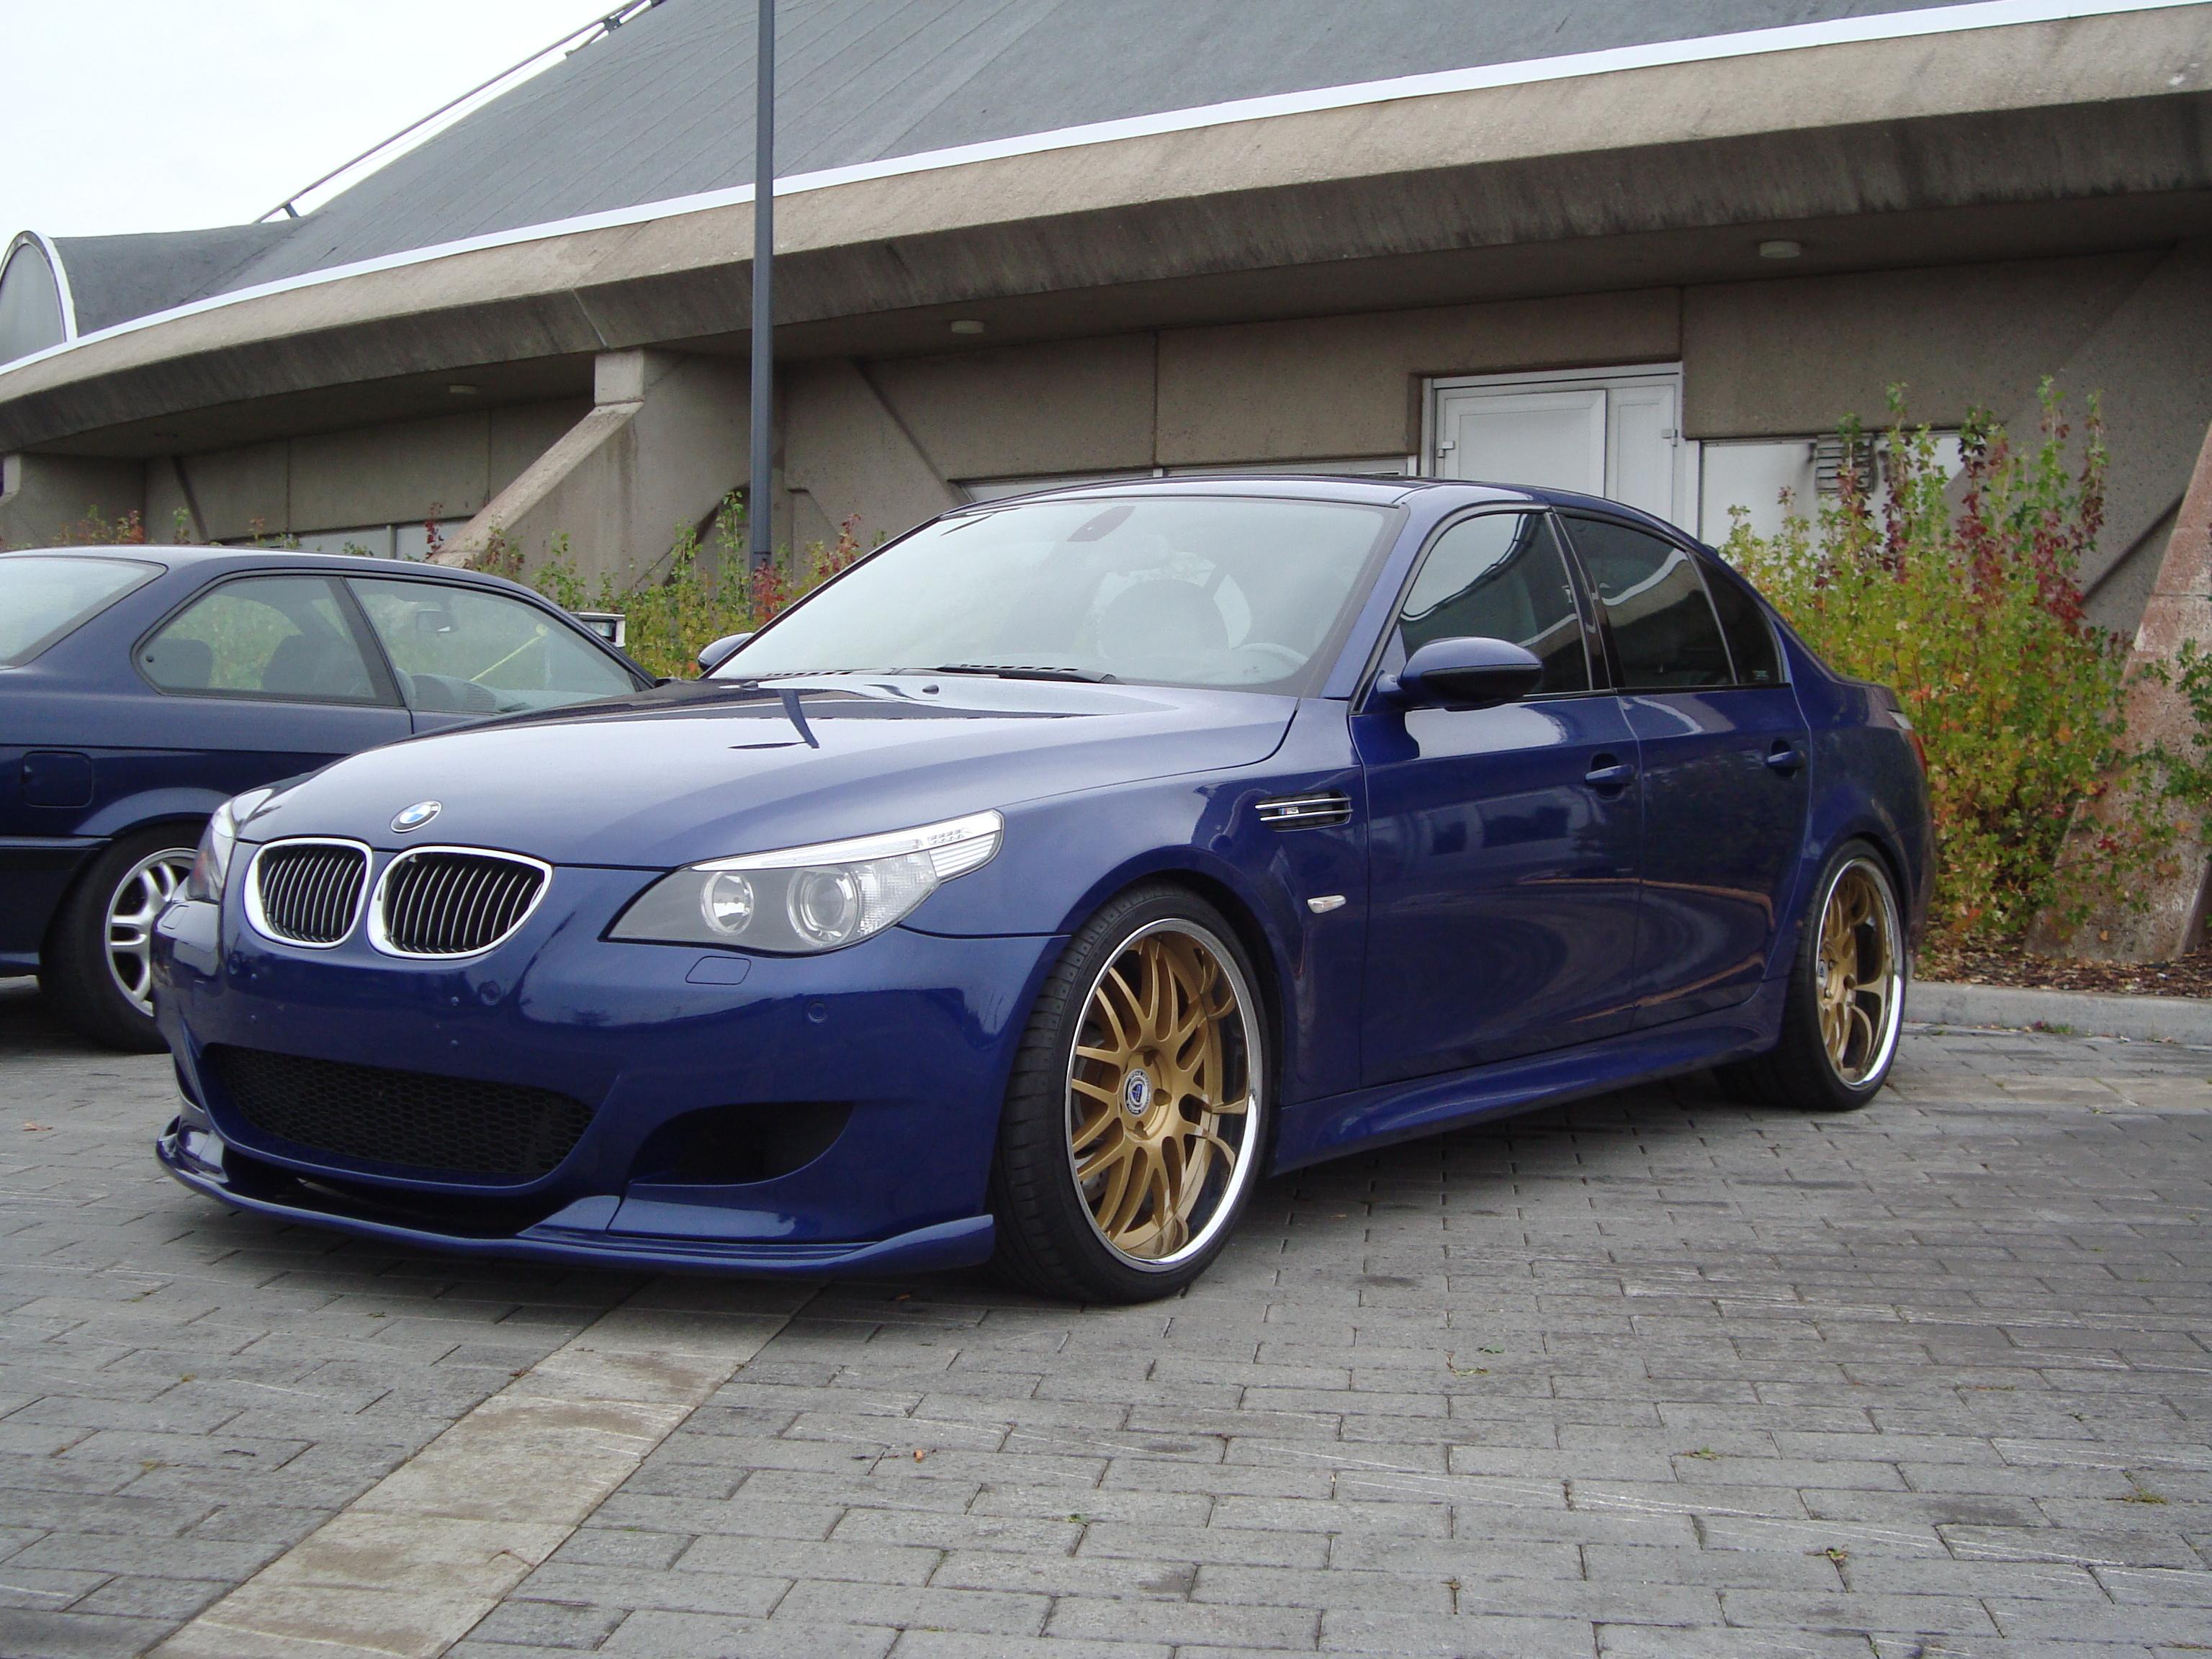 Interlagos blue M5 E60 with new wheels - BMW M5 Forum and ...